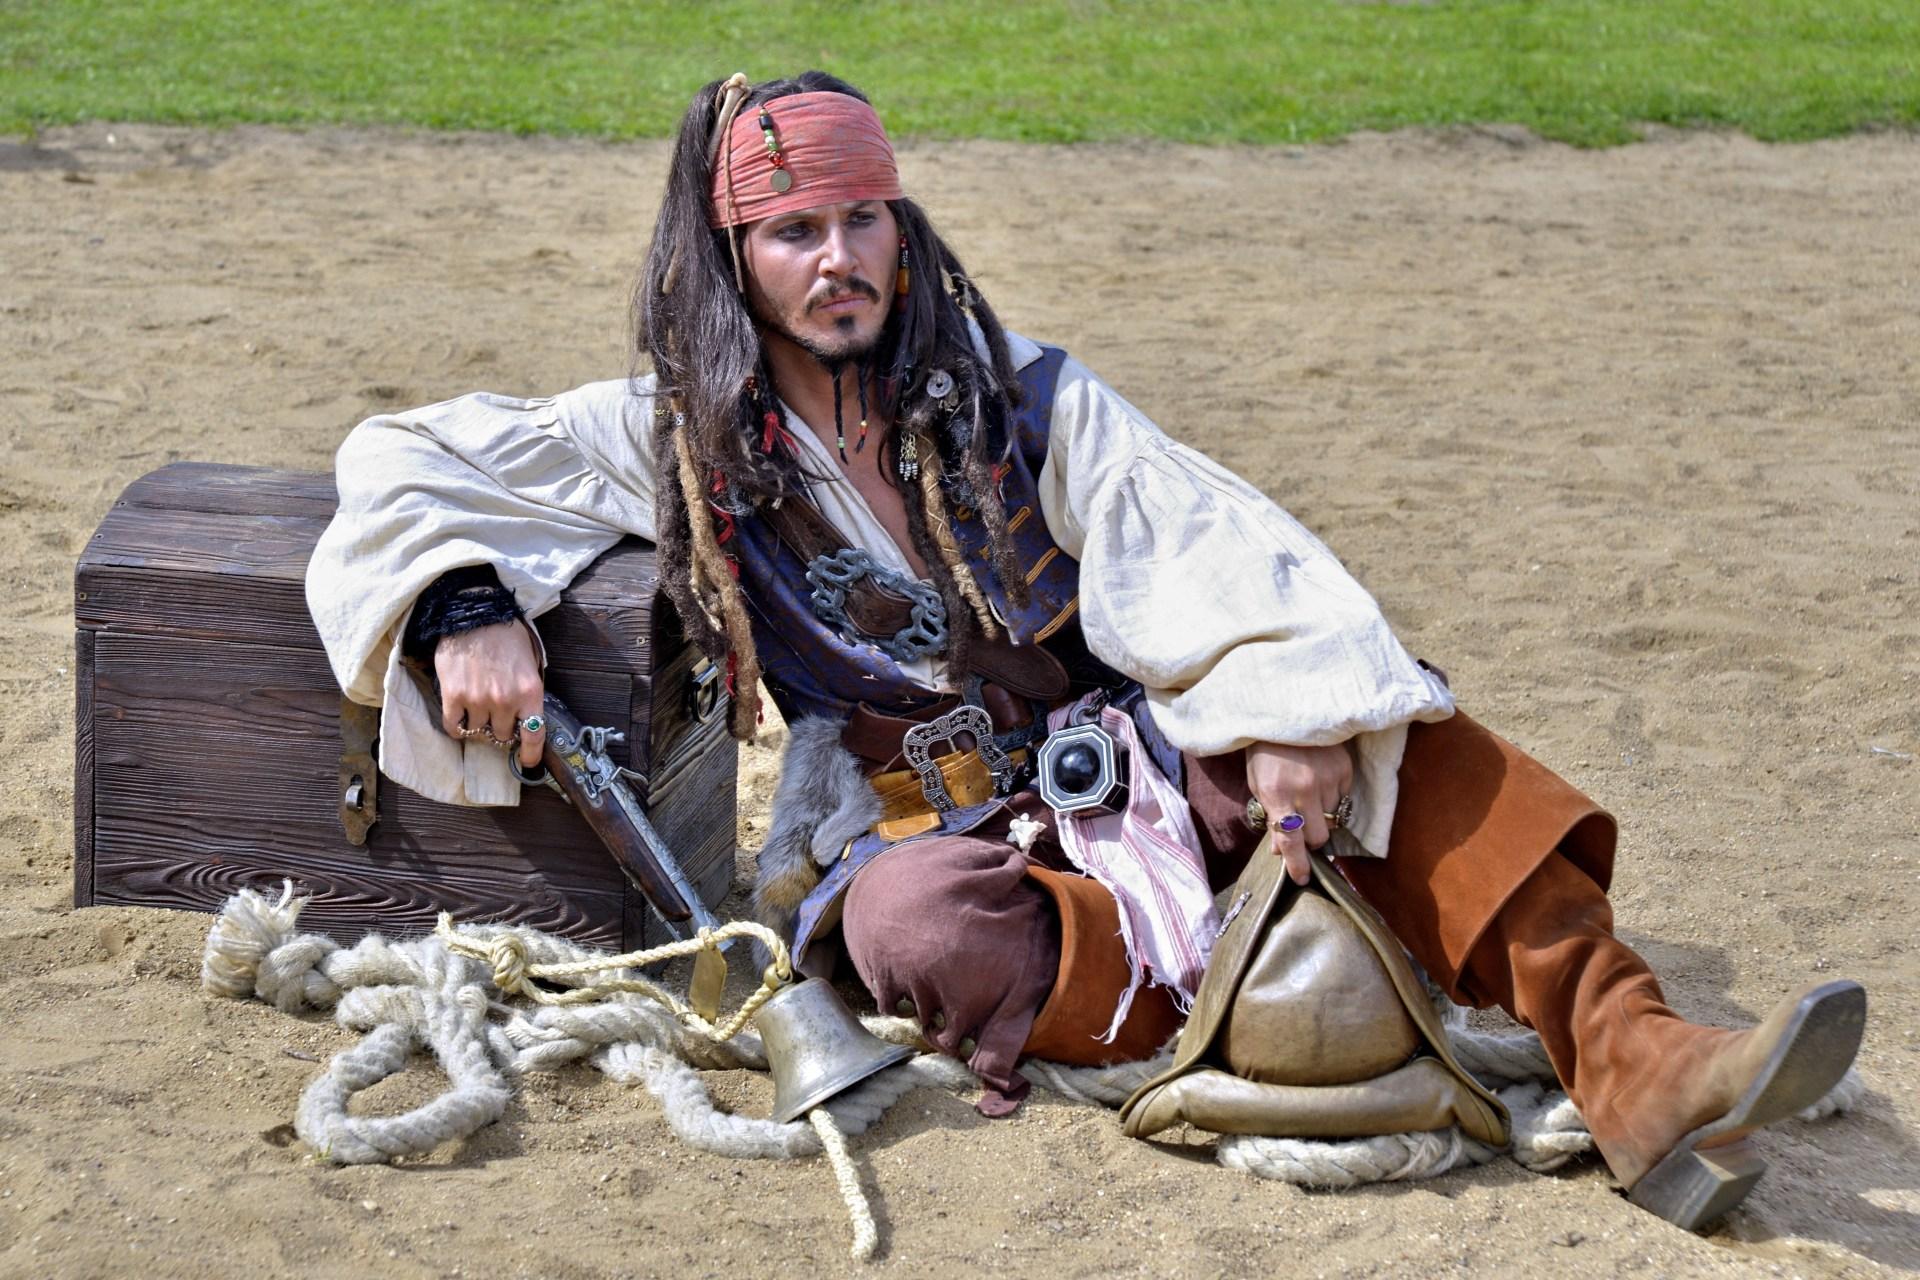 80+ Hilarious, Laugh Out Loud Pirate Jokes